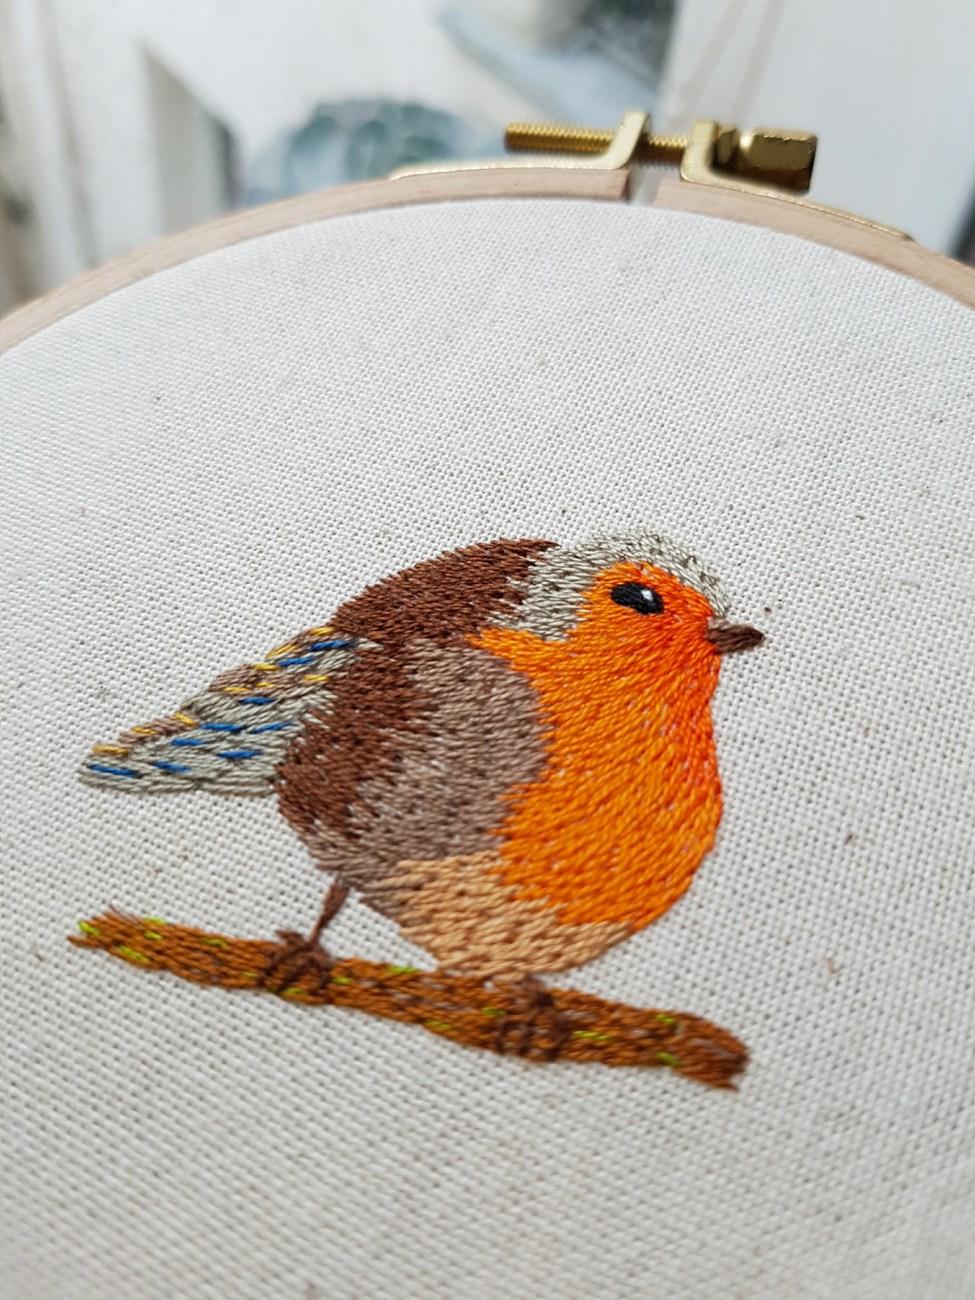 broderie-oiseau-gros-plan